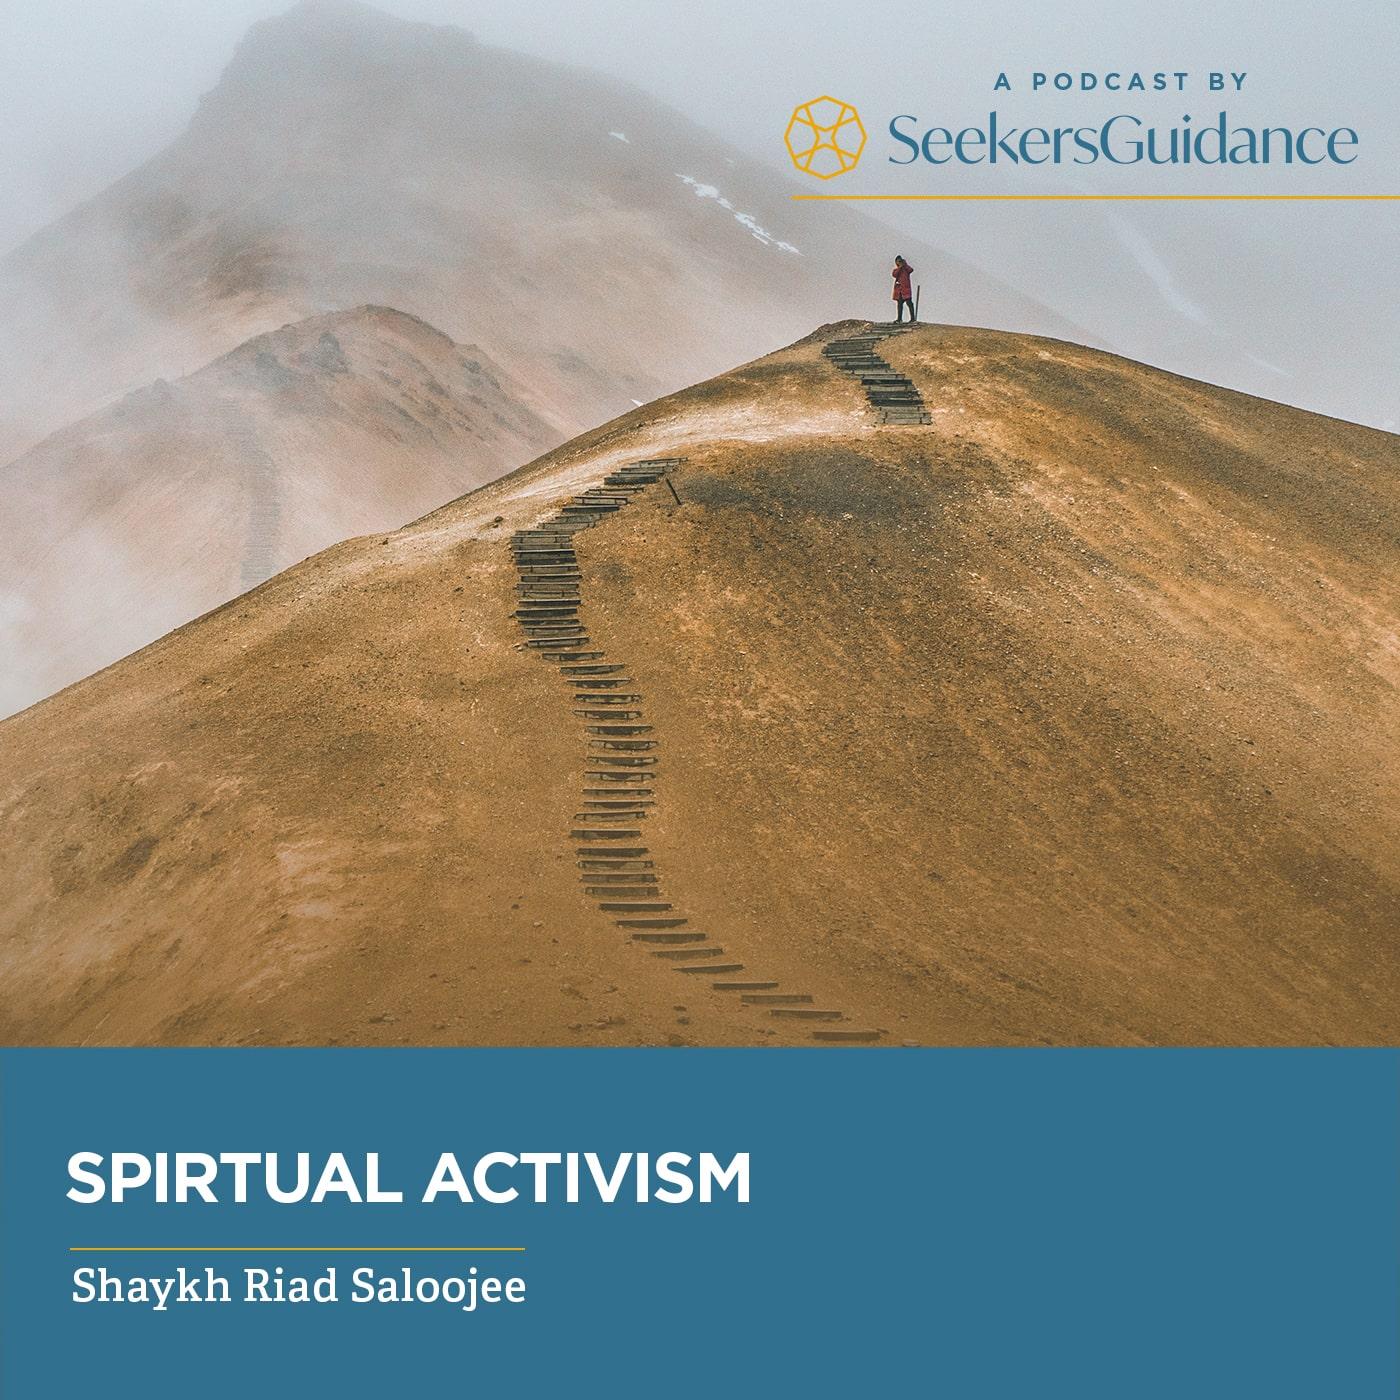 Spiritual Activism with Shaykh Riad Saloojee